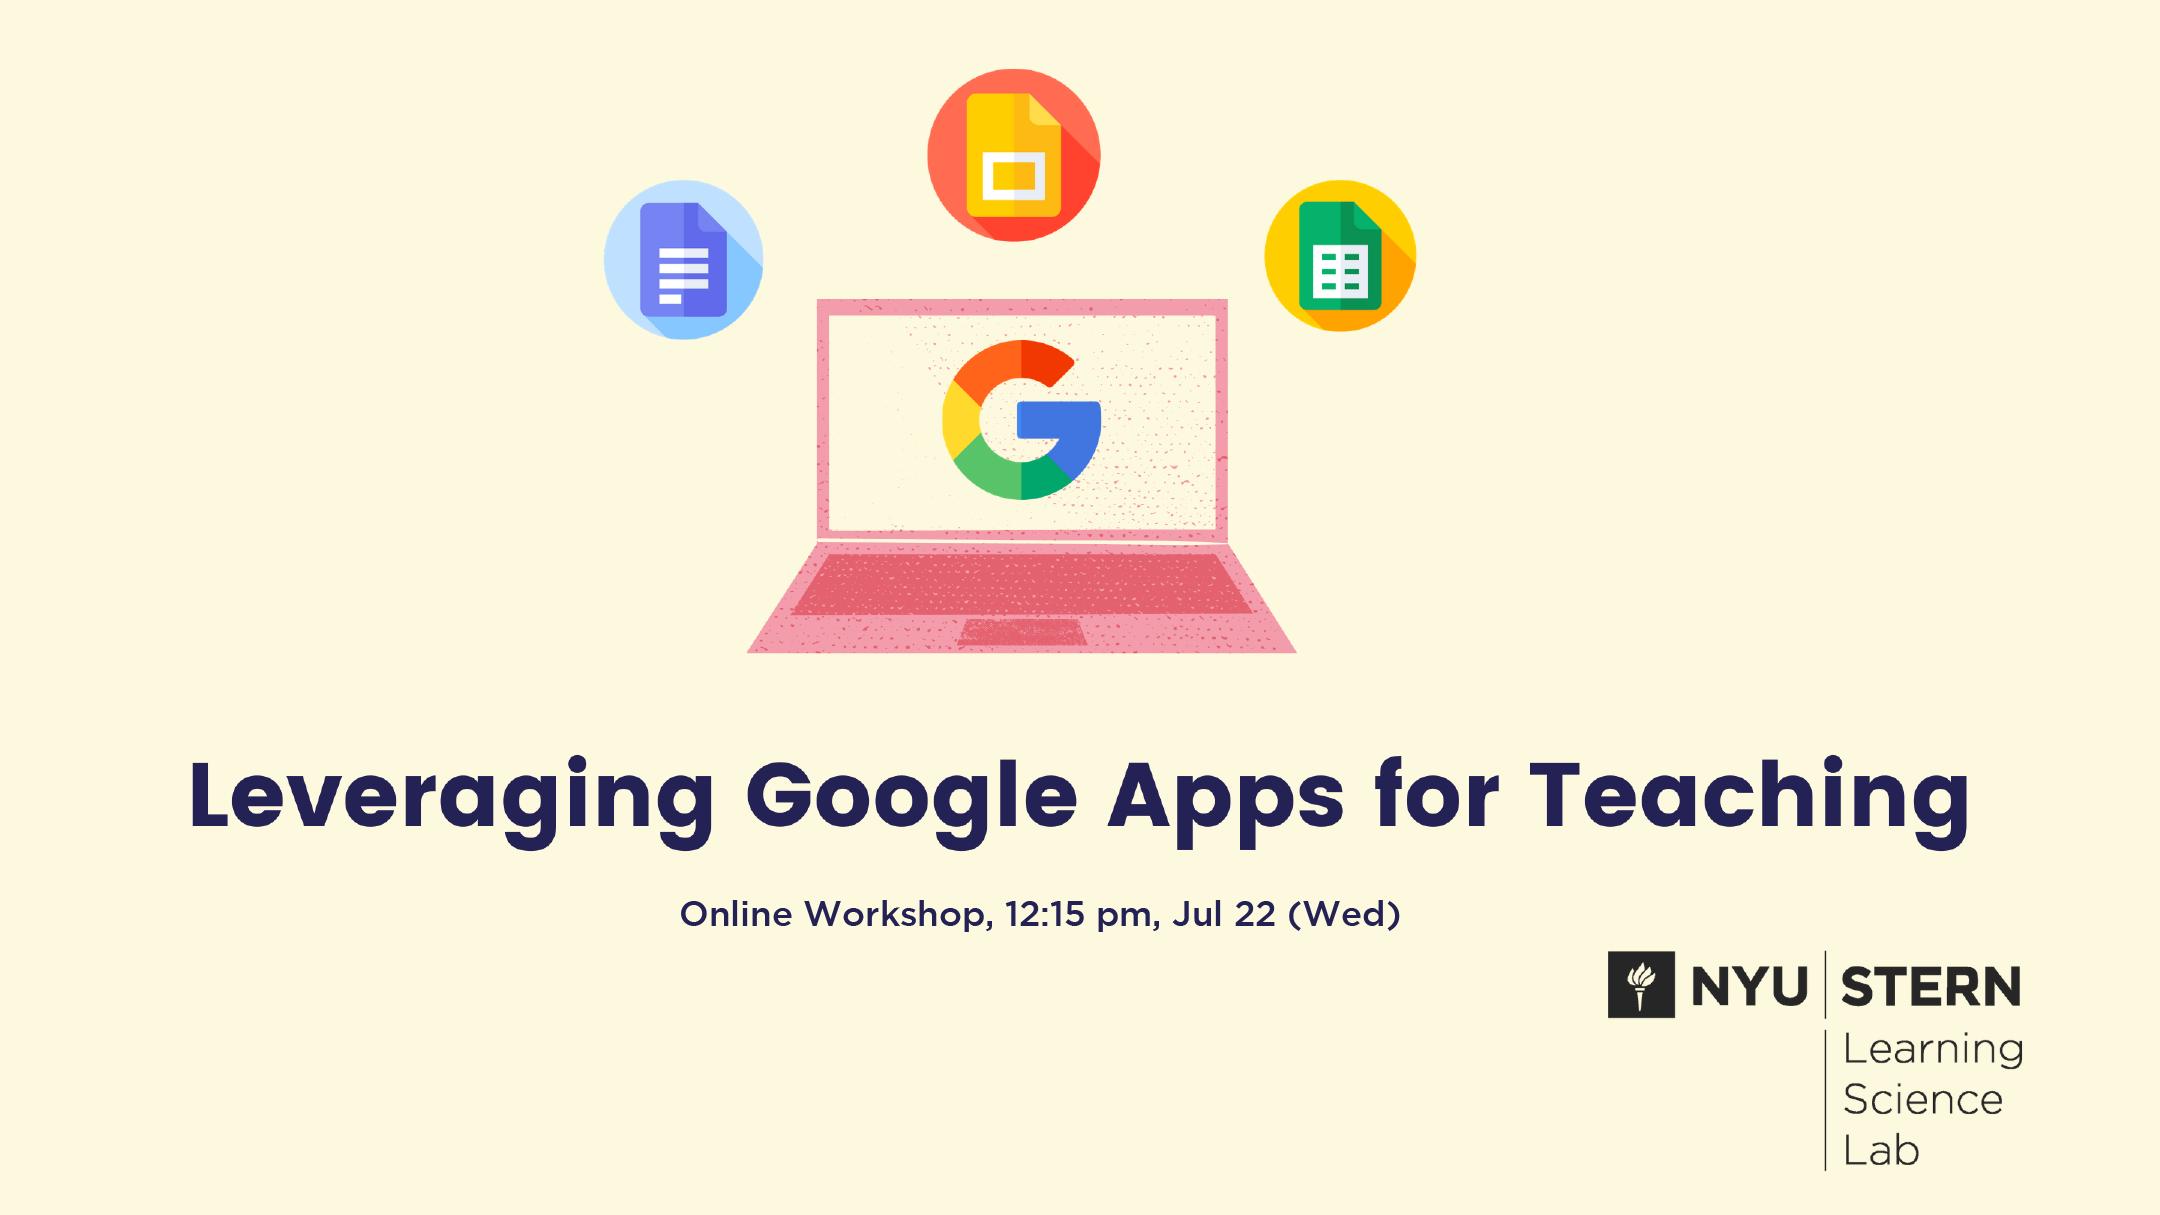 Leveraging Google Apps